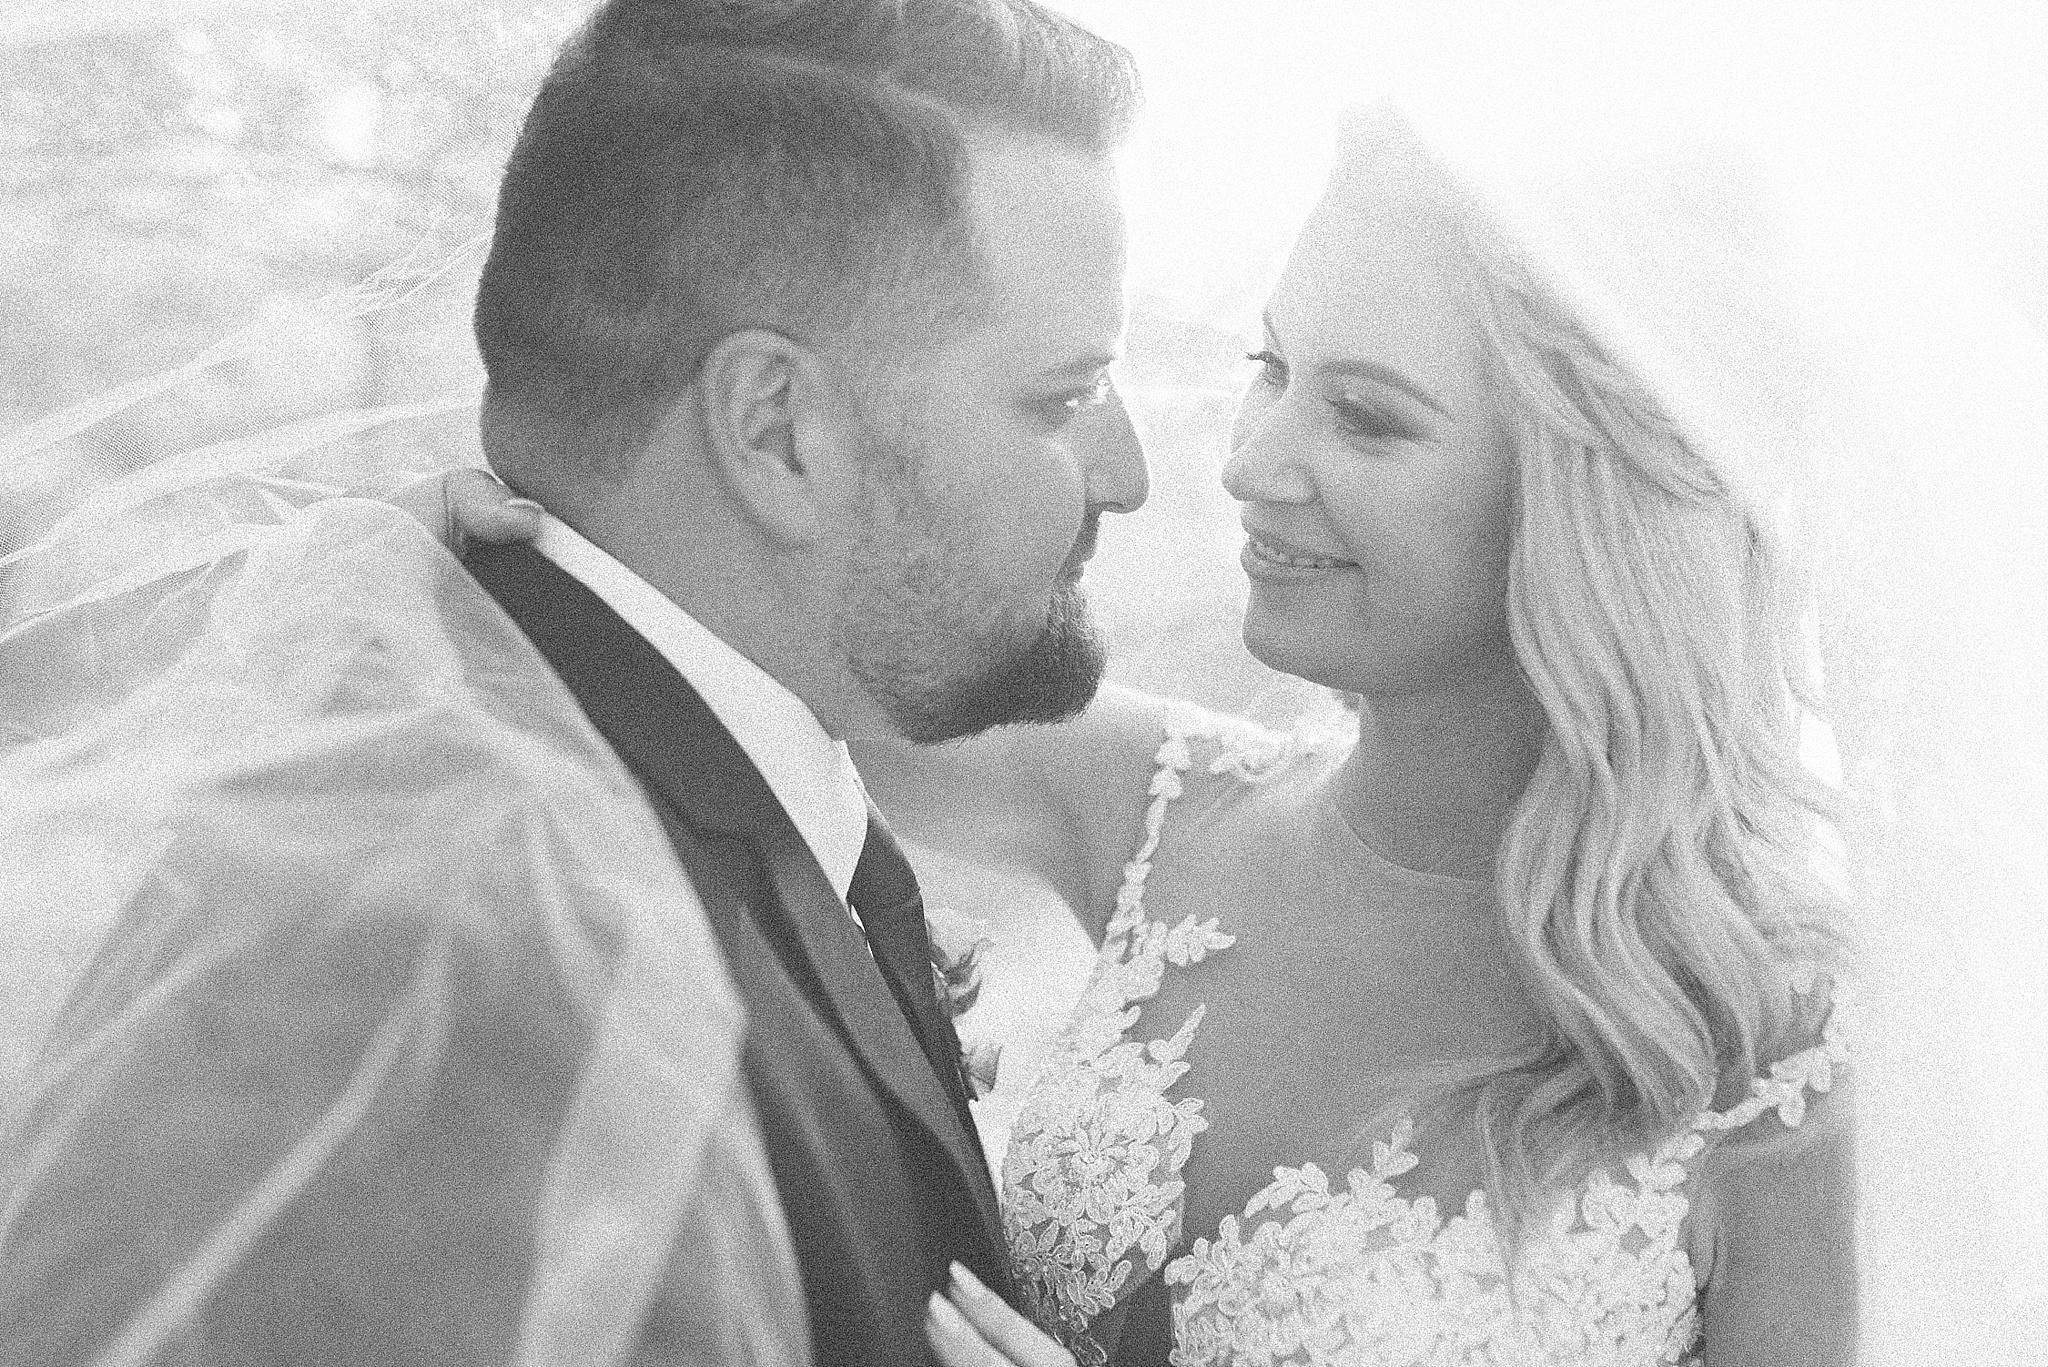 Cape Town Photographer Darren Bester - Die Woud Wedding - Gareth & Roxanne_0048.jpg